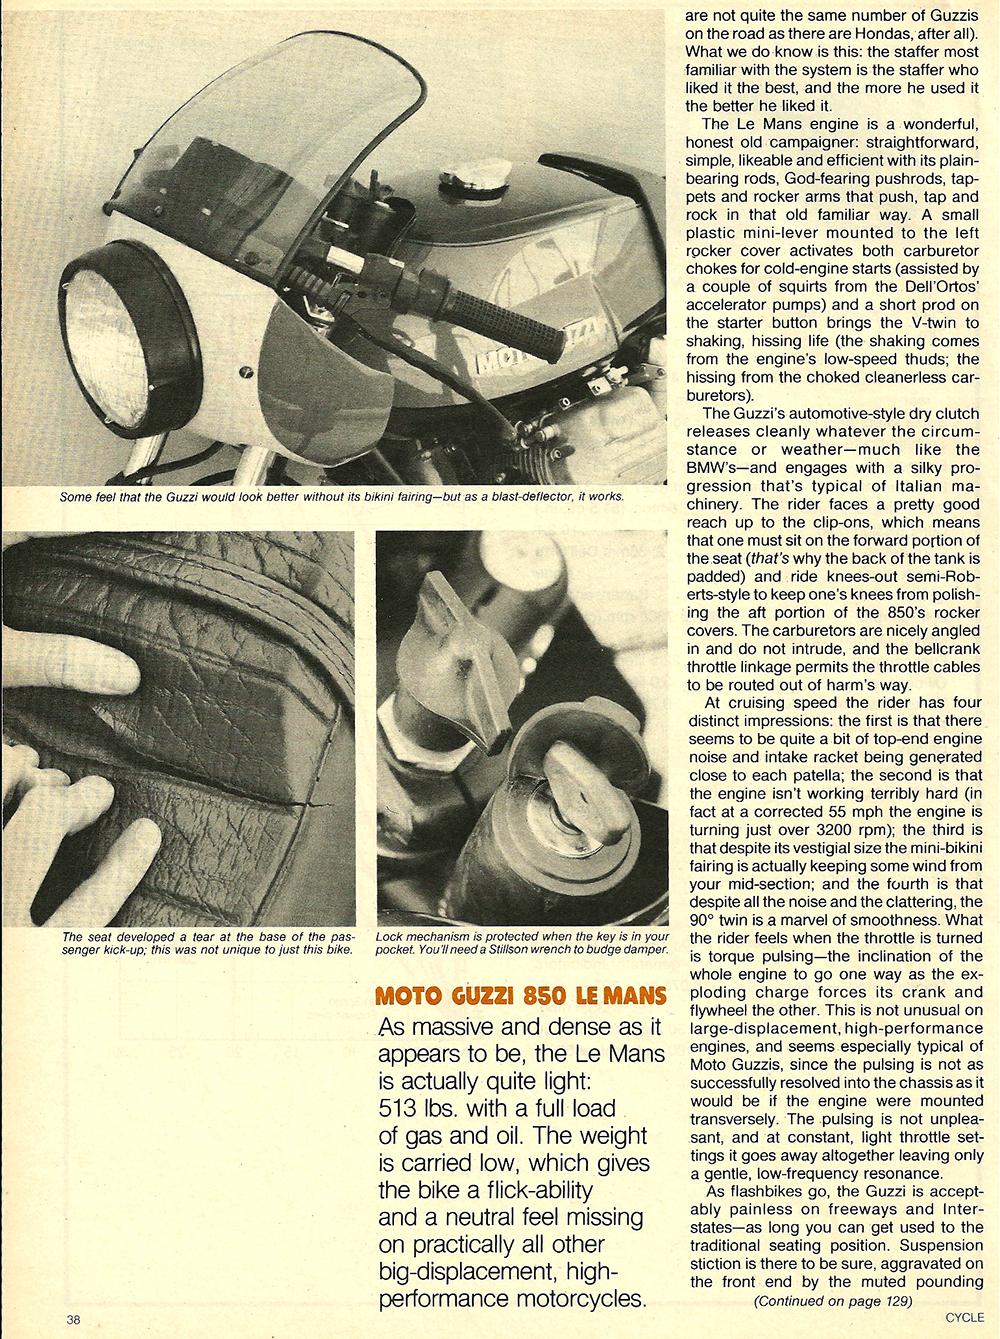 1977 Moto Guzzi 850 LeMans road test 07.jpg